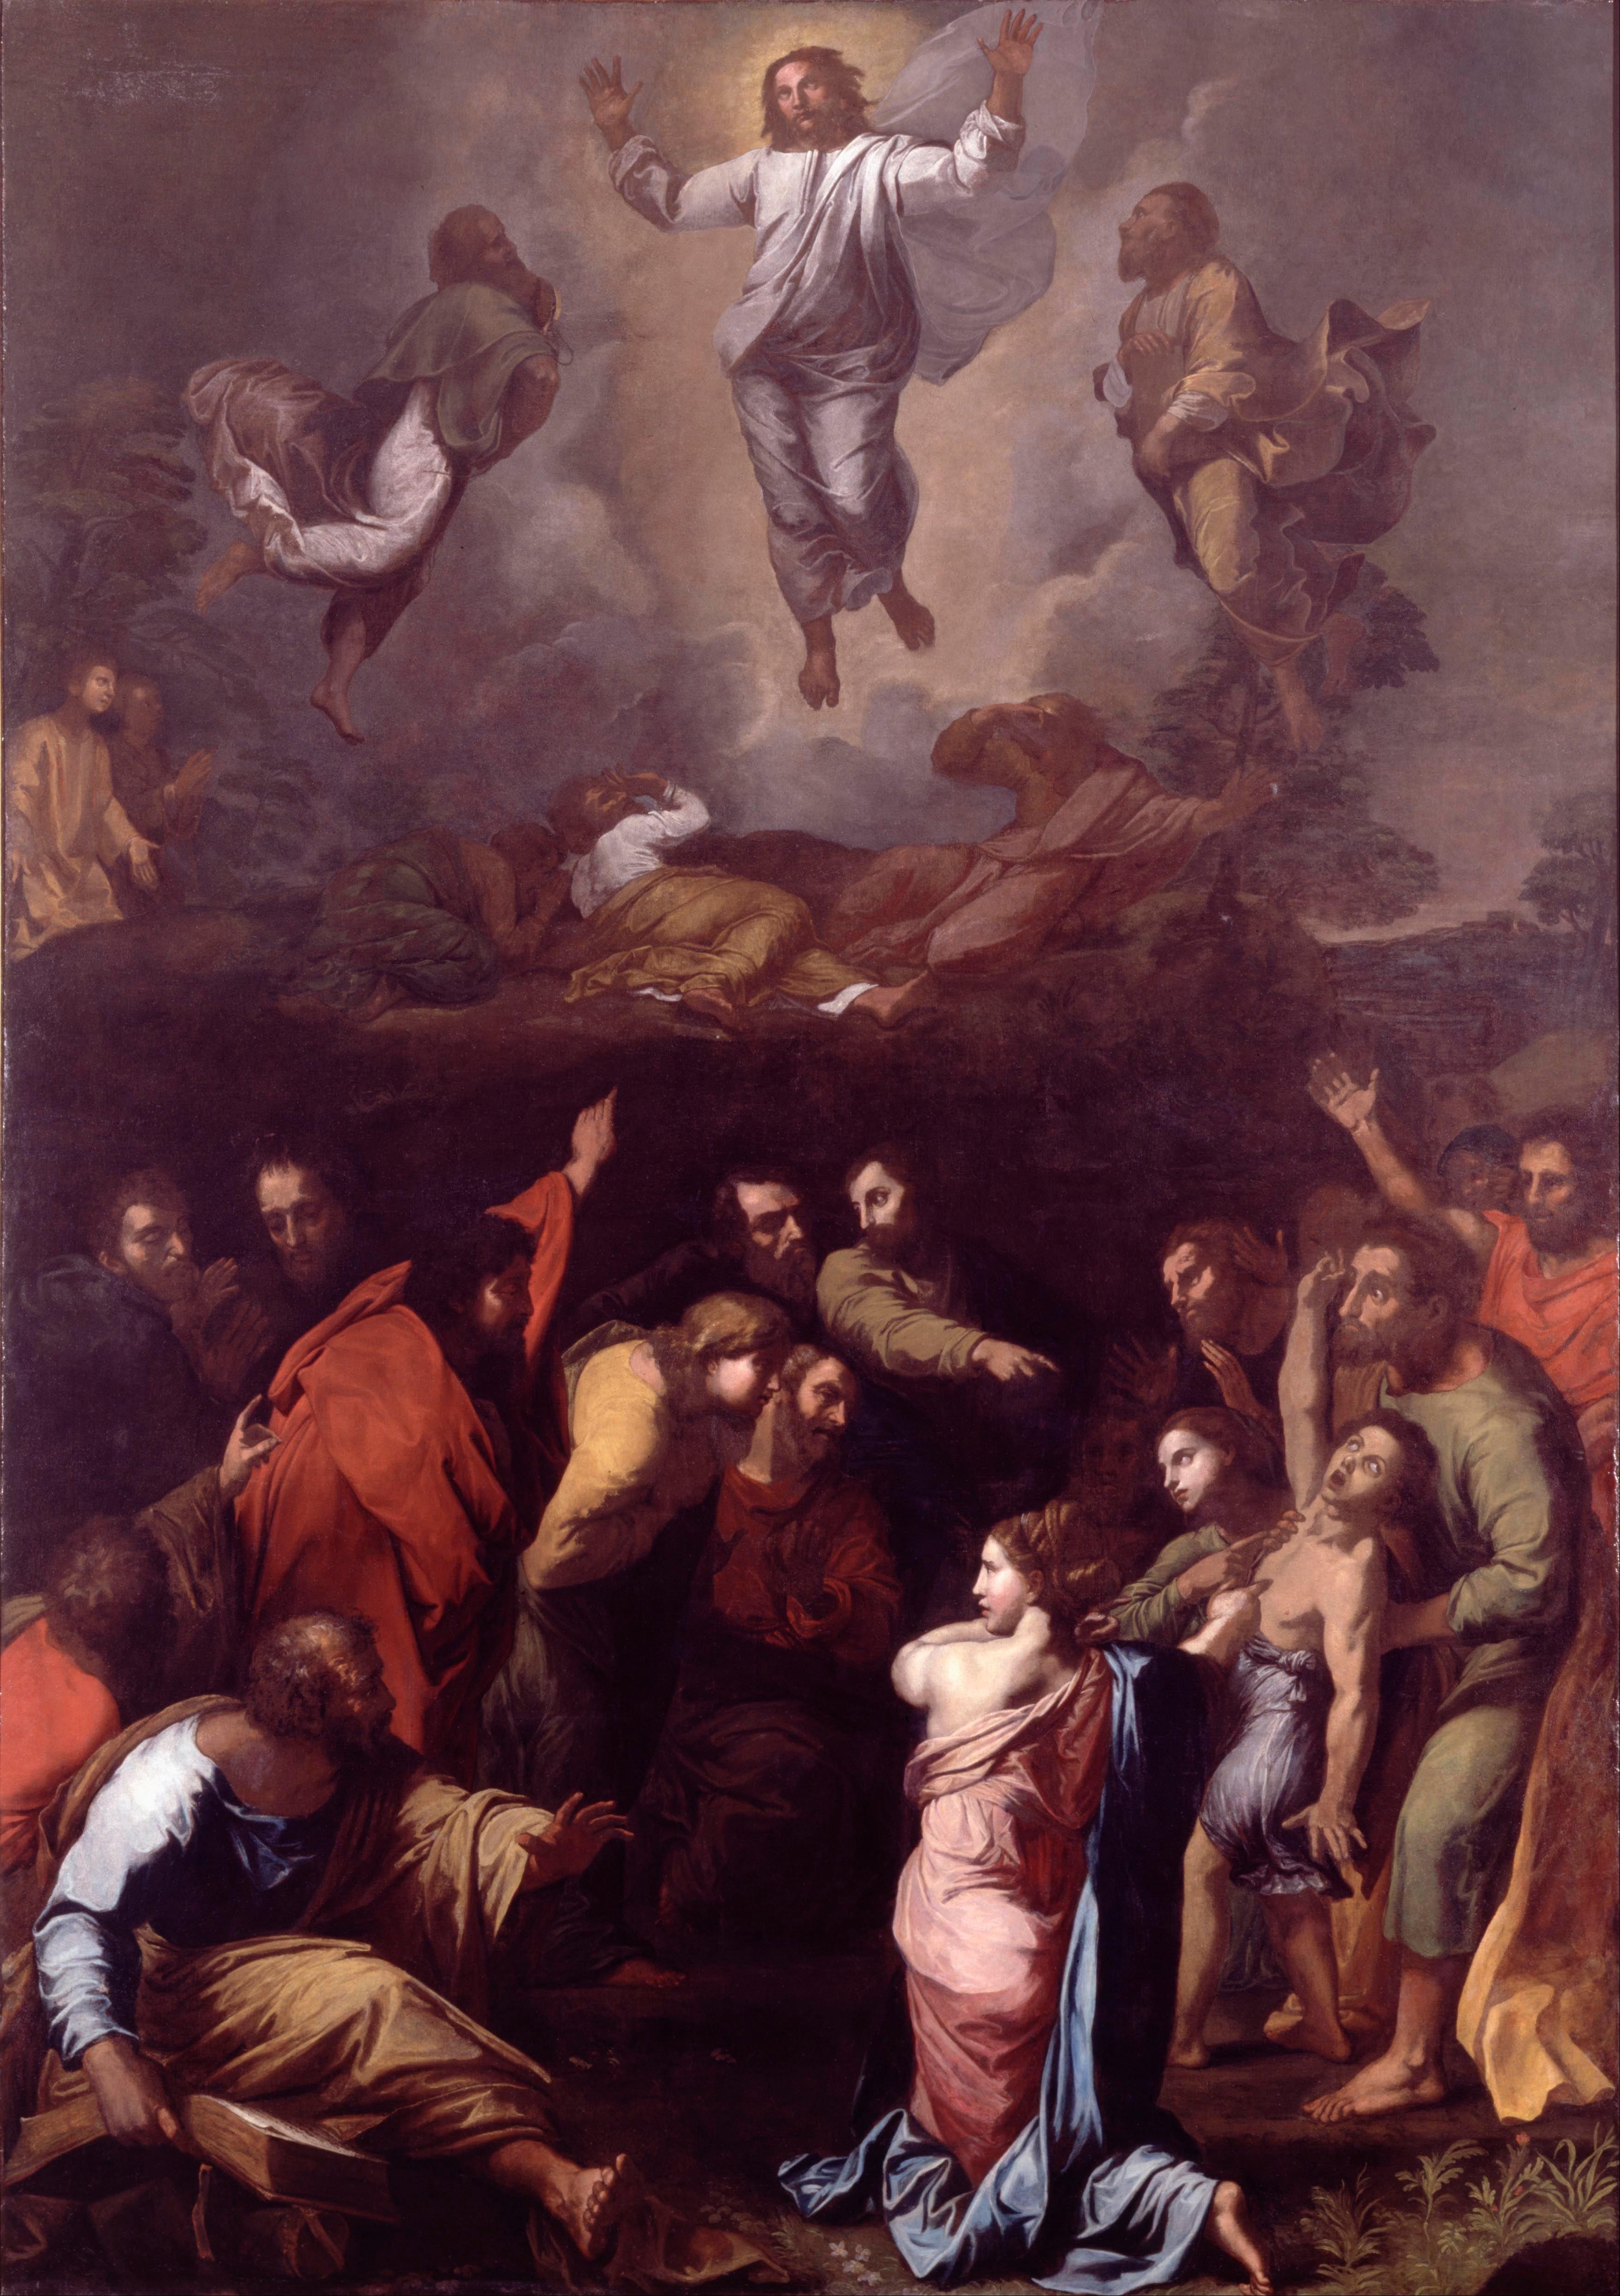 File:Raphael - The Transfiguration - Google Art Project.jpg